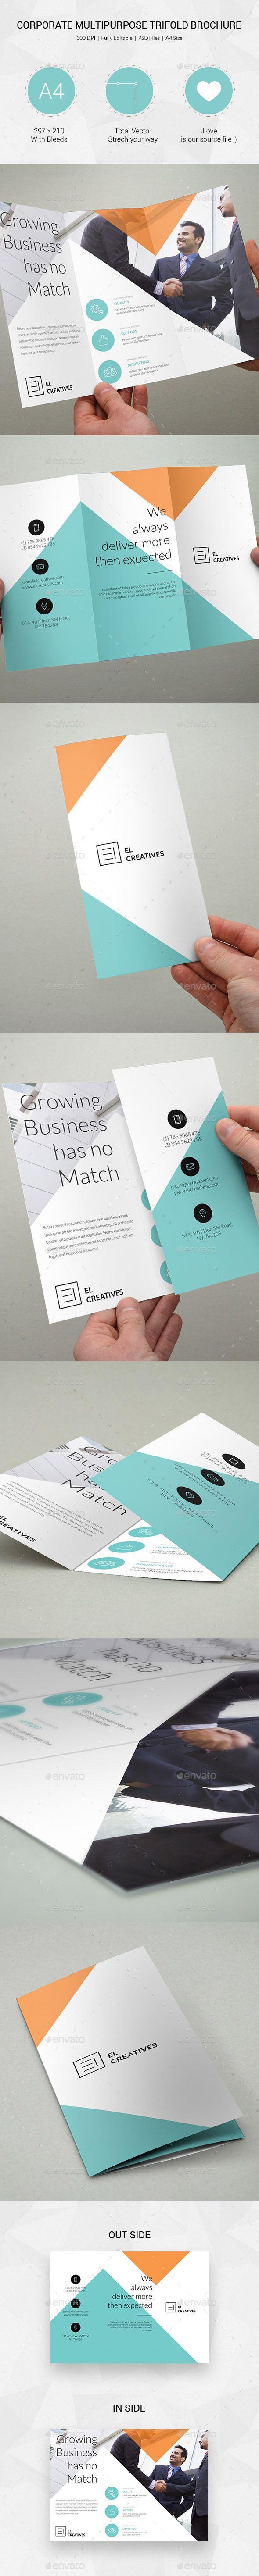 Minimal Creative Trifold Brochure Template #design Buy Now: http://graphicriver.net/item/minimal-creative-trifold-brochure-16/12850944?ref=ksioks